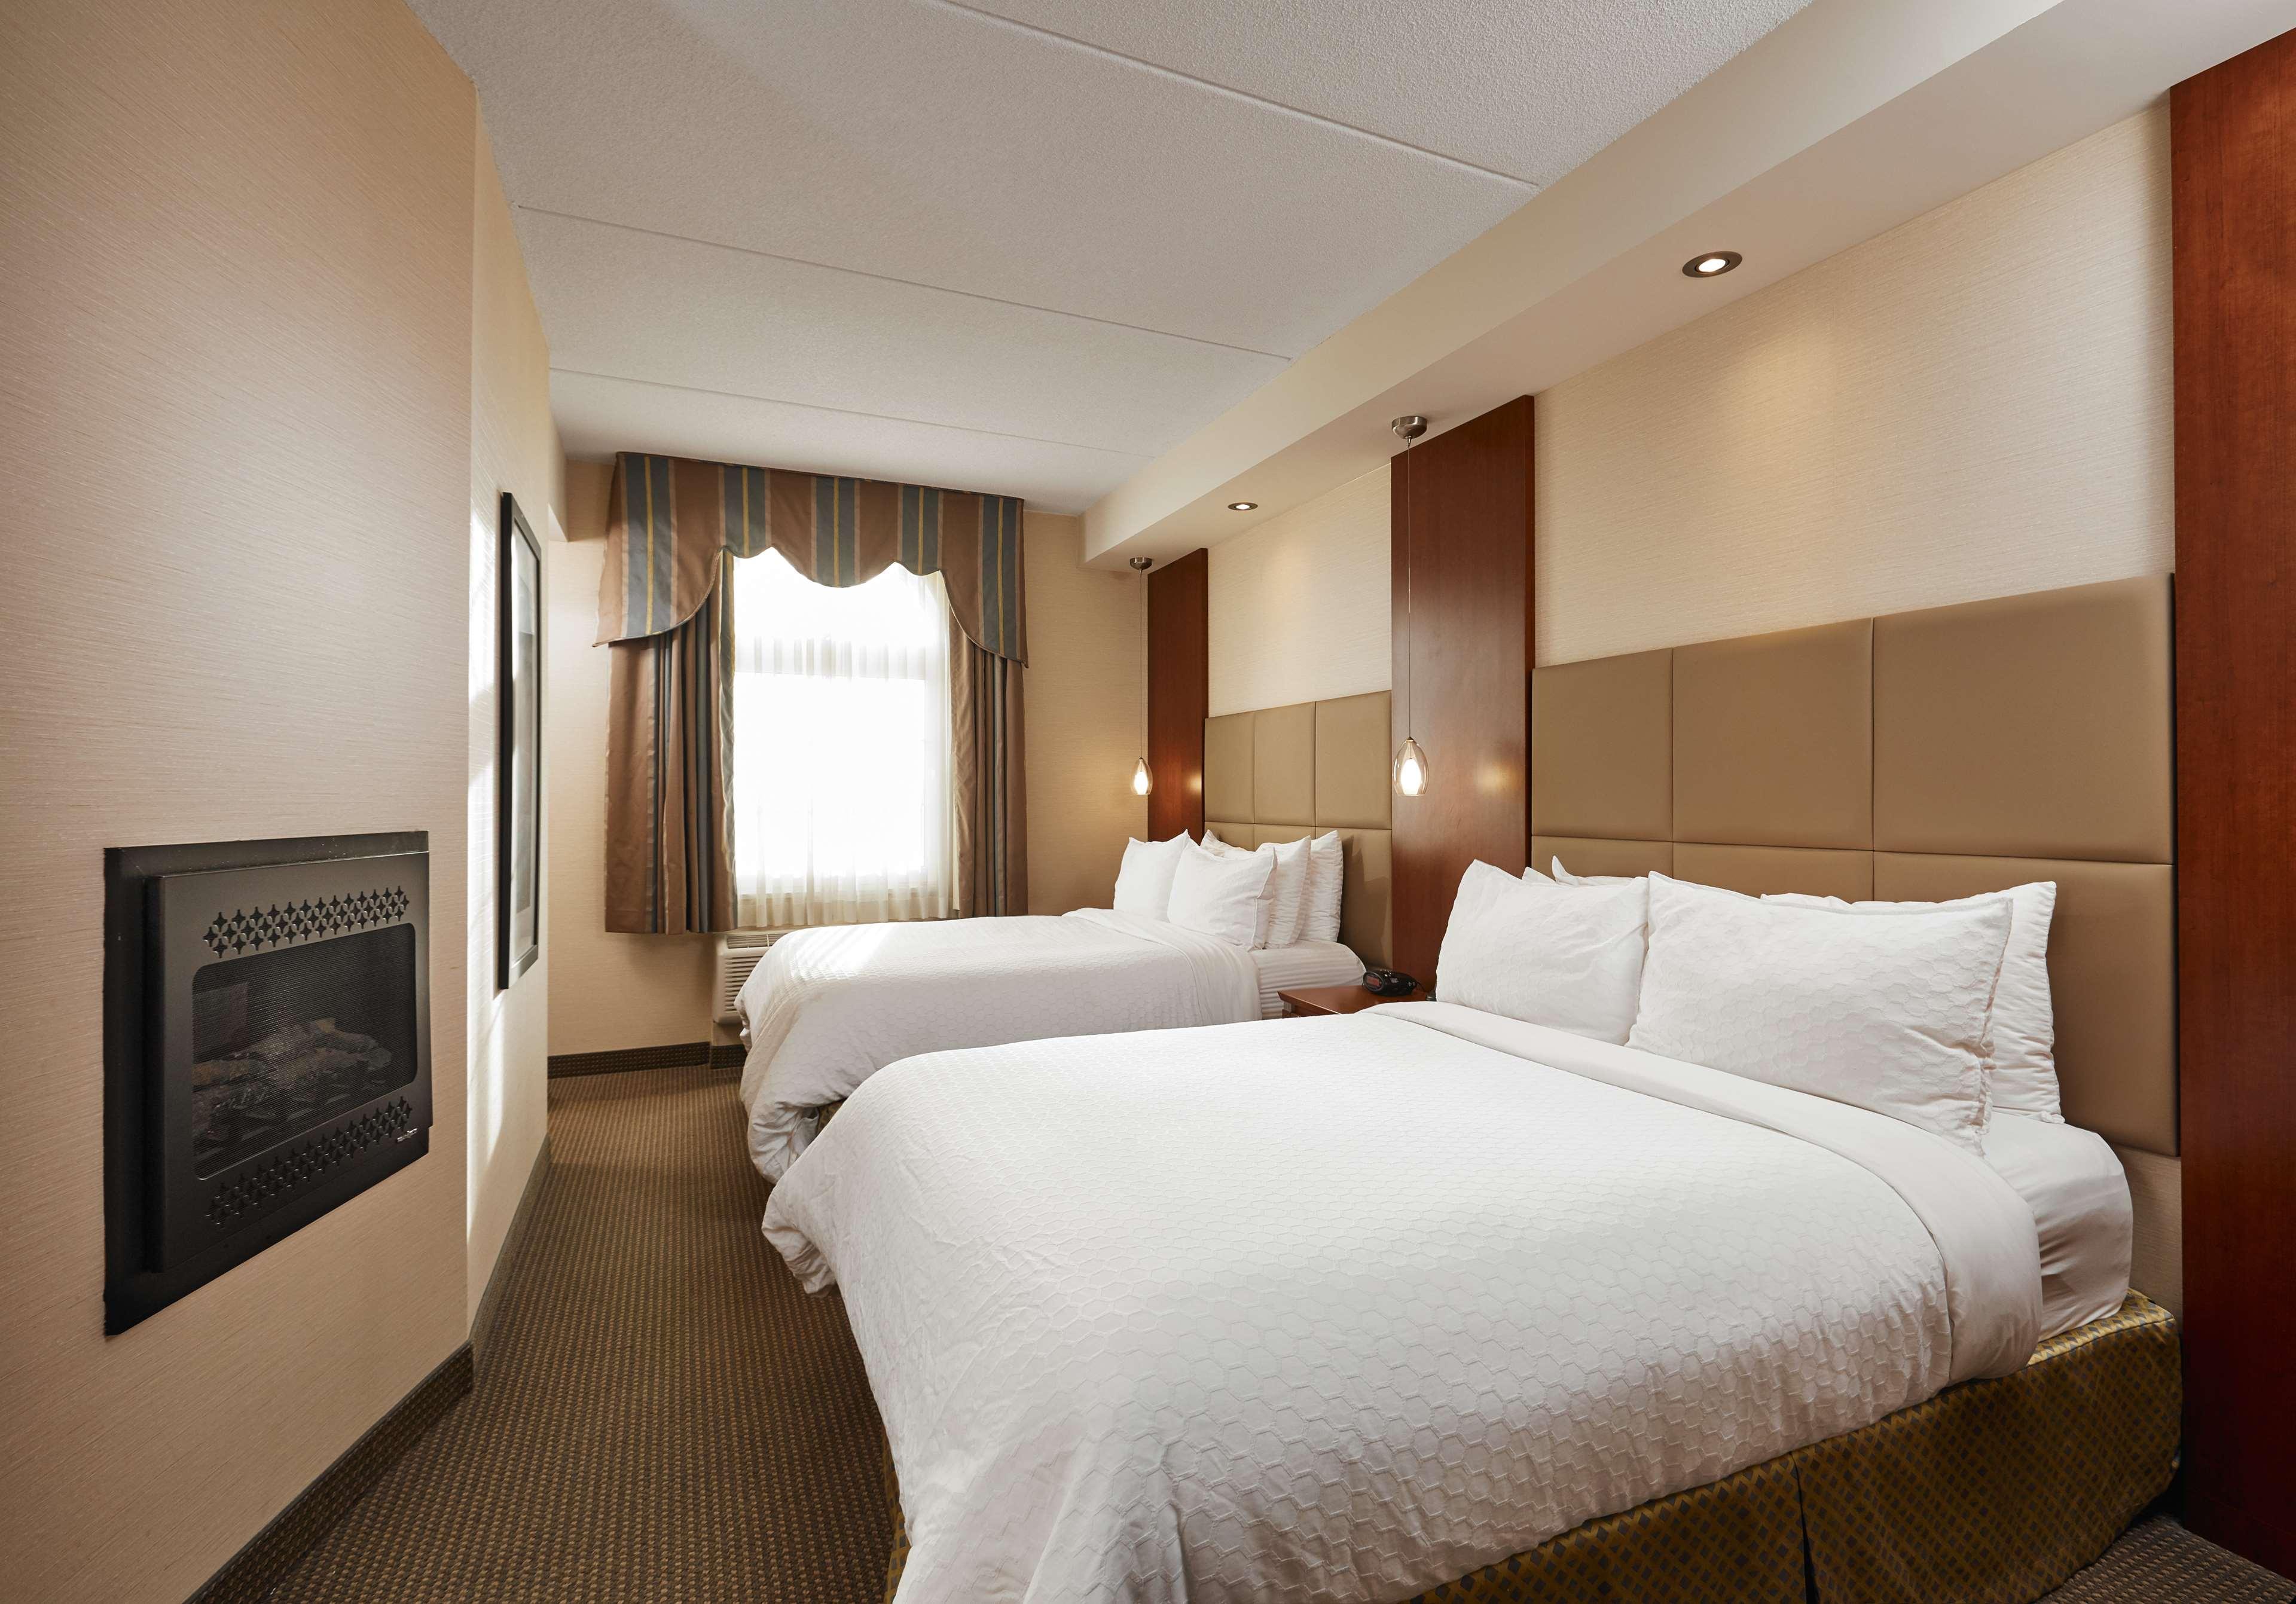 2 Queens Guest Room Best Western Plus Orangeville Inn & Suites Orangeville (519)941-3311